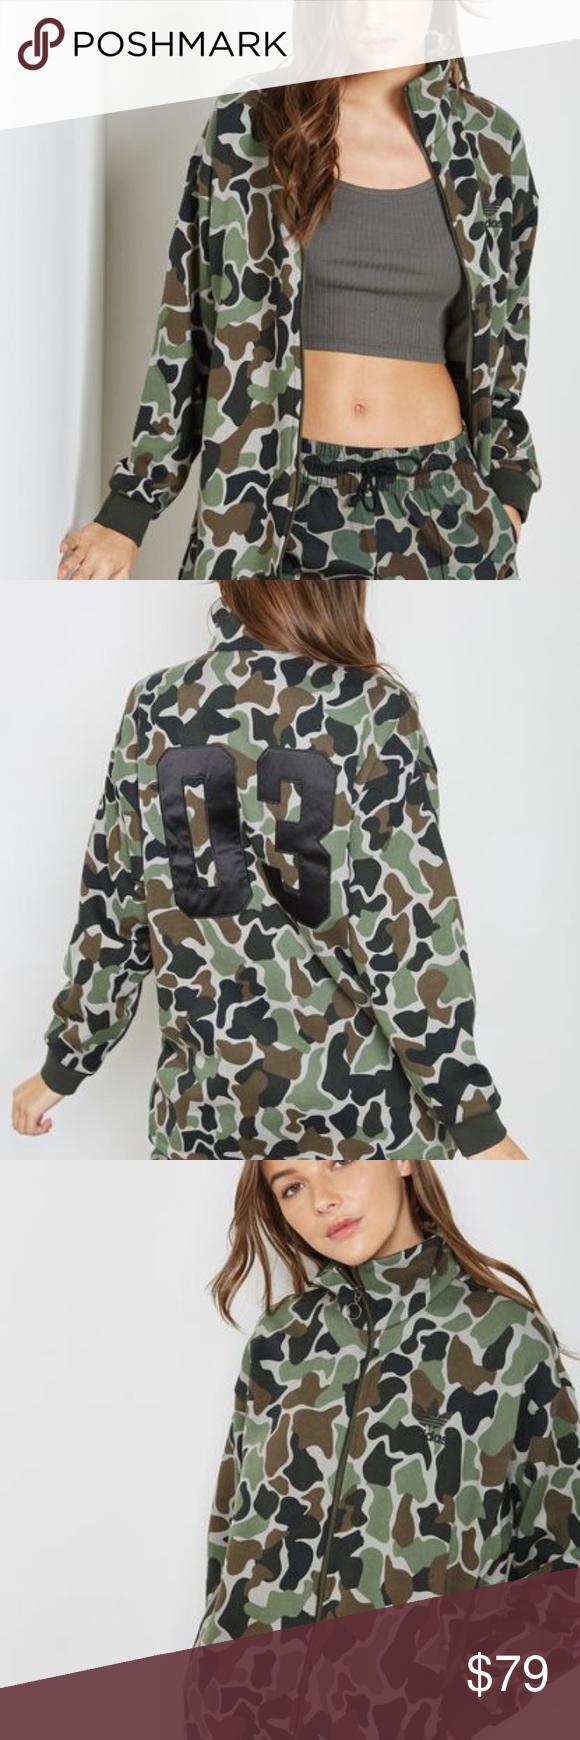 Camo Print Trefoil Sweatshirt By Adidas Originals Adidas Outfit Men Sweatshirts Hoodie Print [ 1530 x 1020 Pixel ]